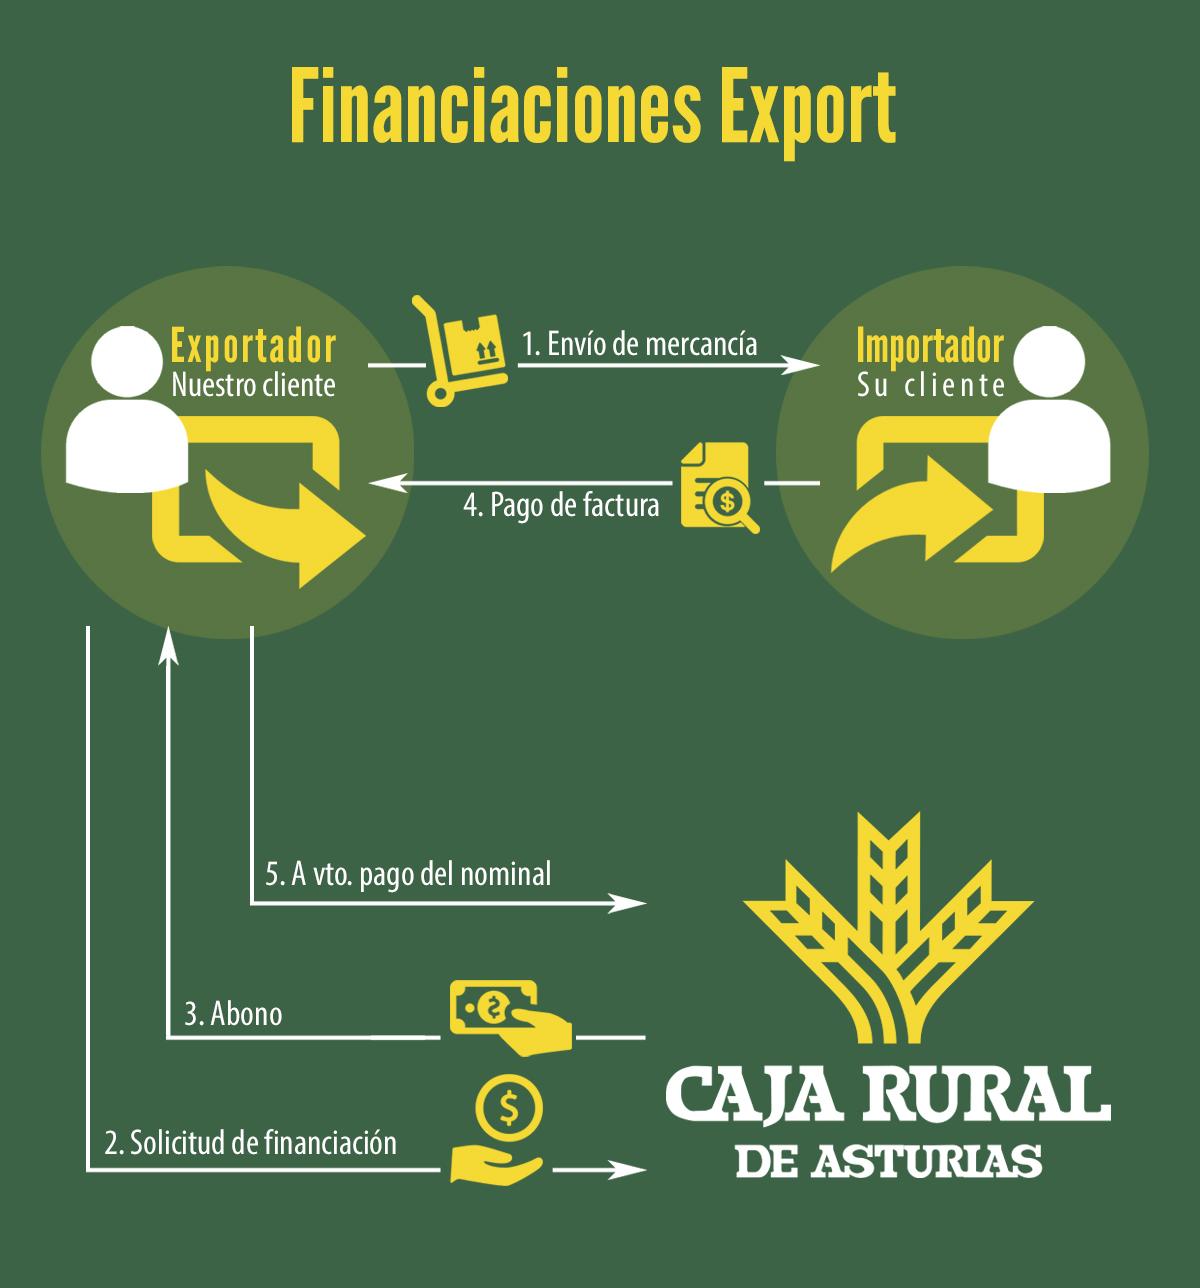 Financiaciones Export